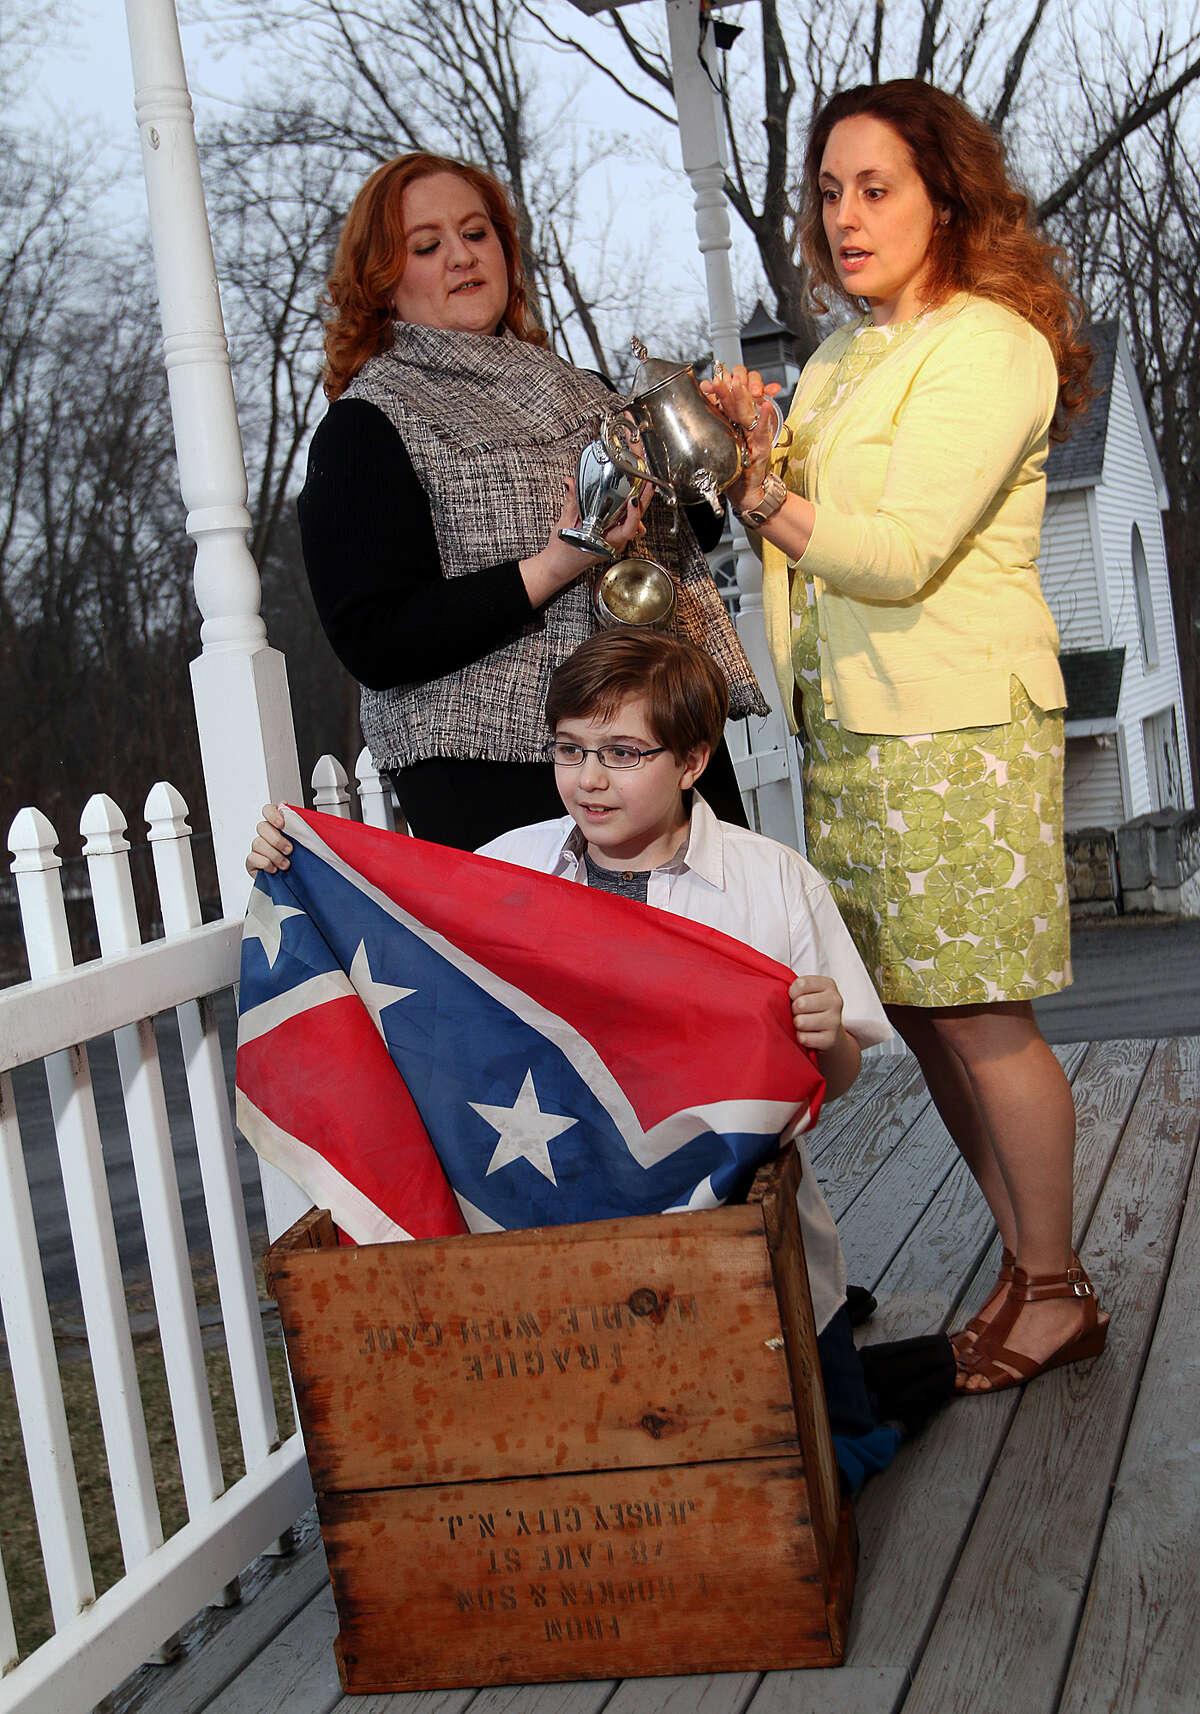 (l-r)Jessica JJ Paul, Jeremiah Mancini & Josephine O'Connor (photo: Tom Killips)